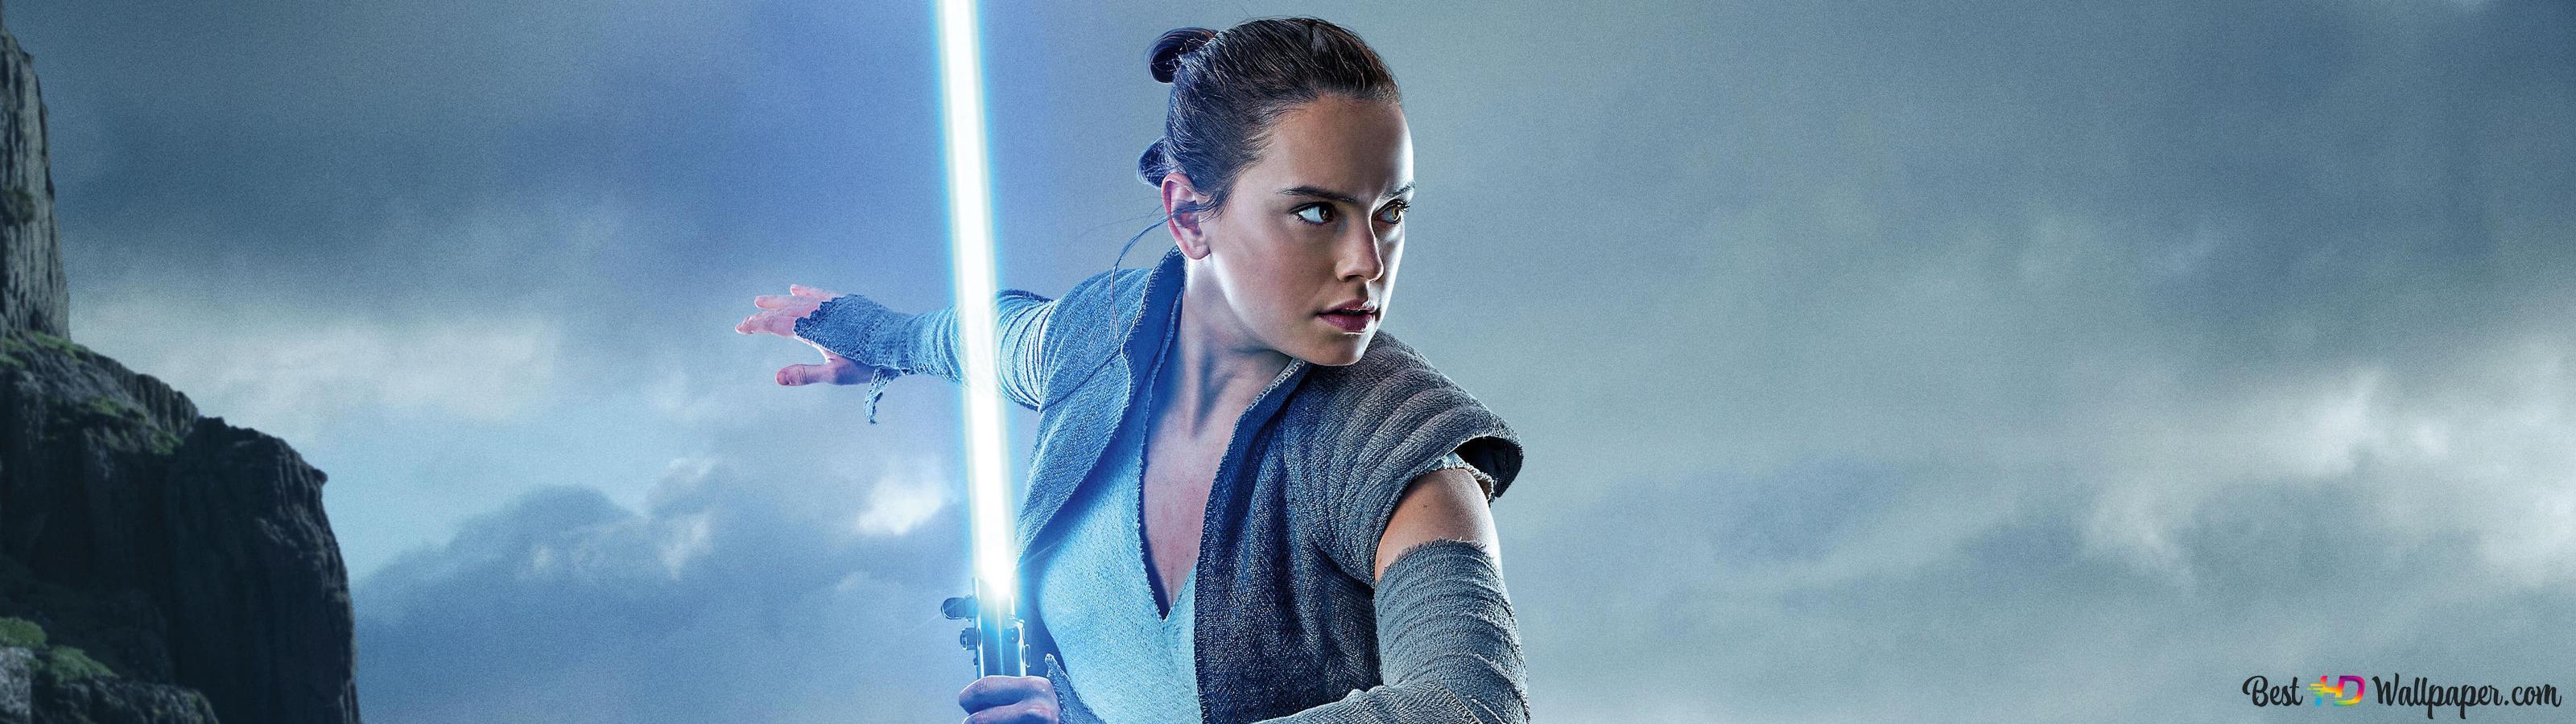 Star Wars The Last Jedi Daisy Ridley Hd Wallpaper Download